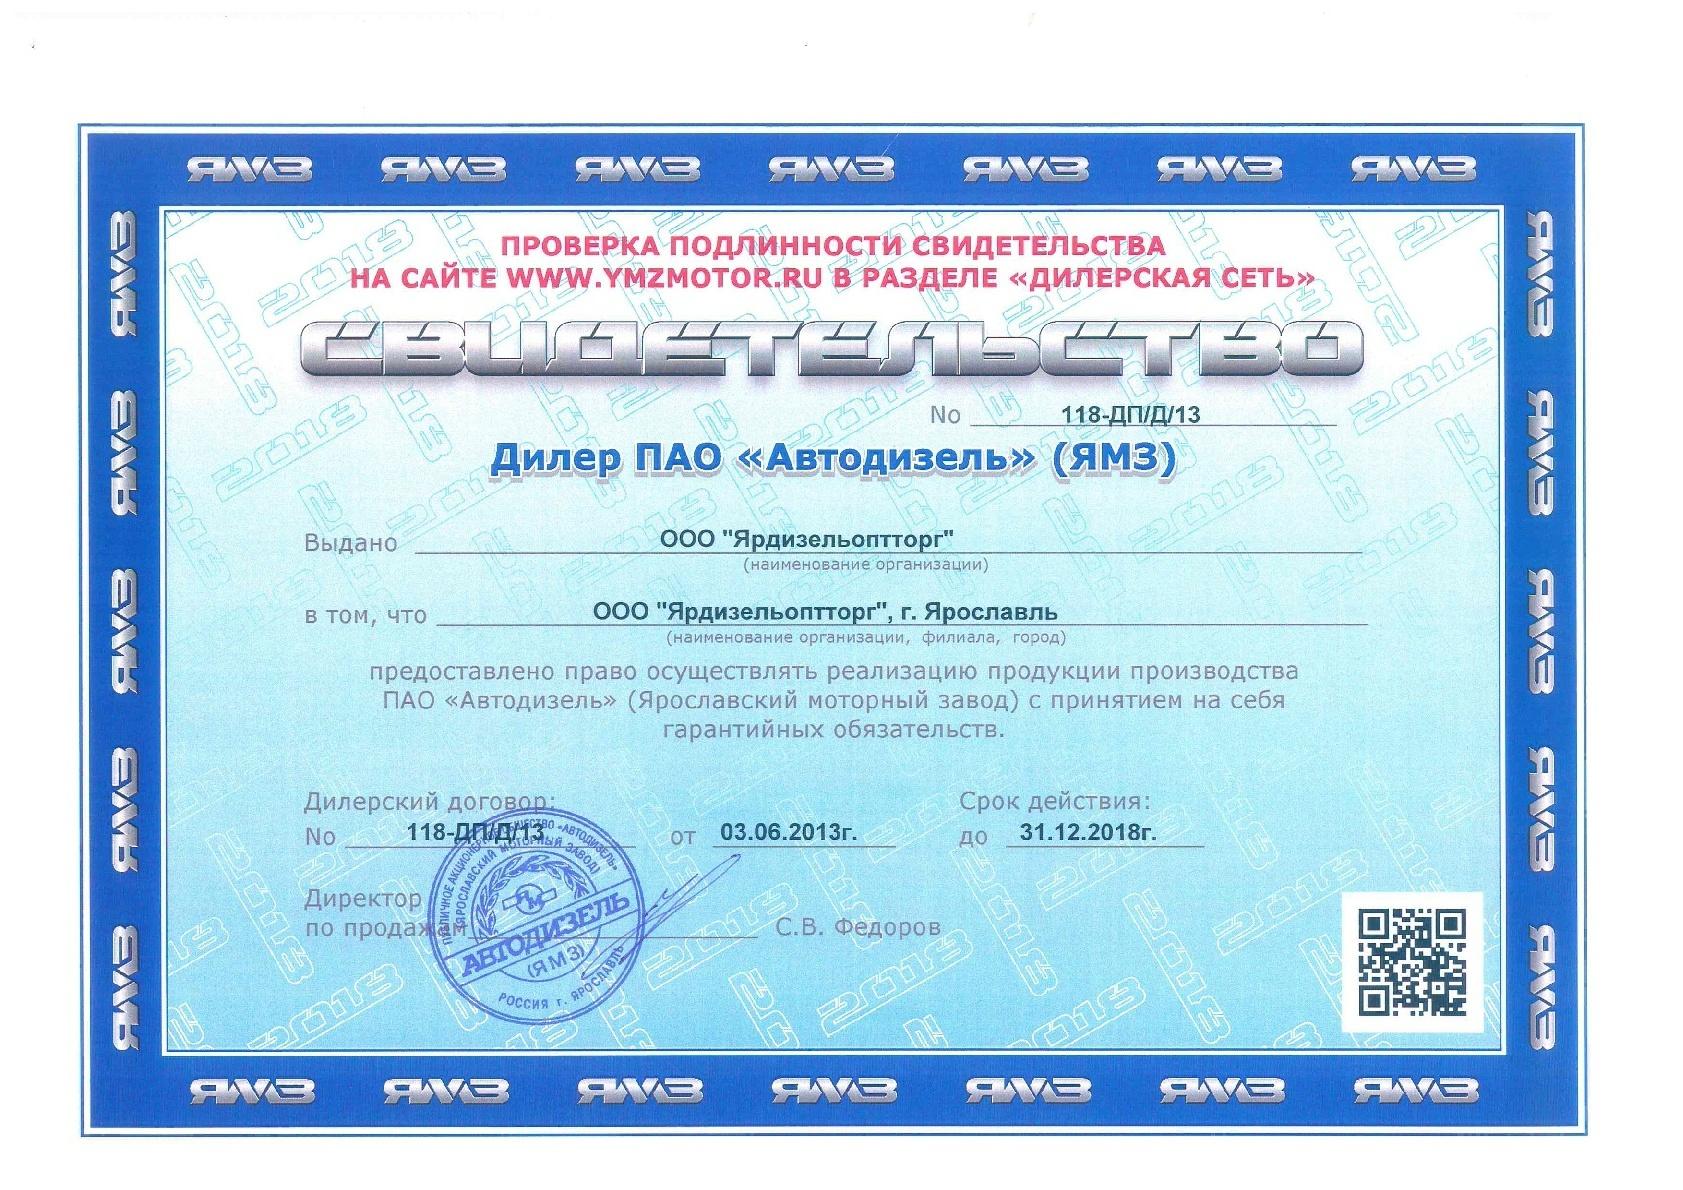 https://ymzdiesel.ru/files/sertificate/Свидетельство_дилера_2018_(ЯМЗ)-001.jpg